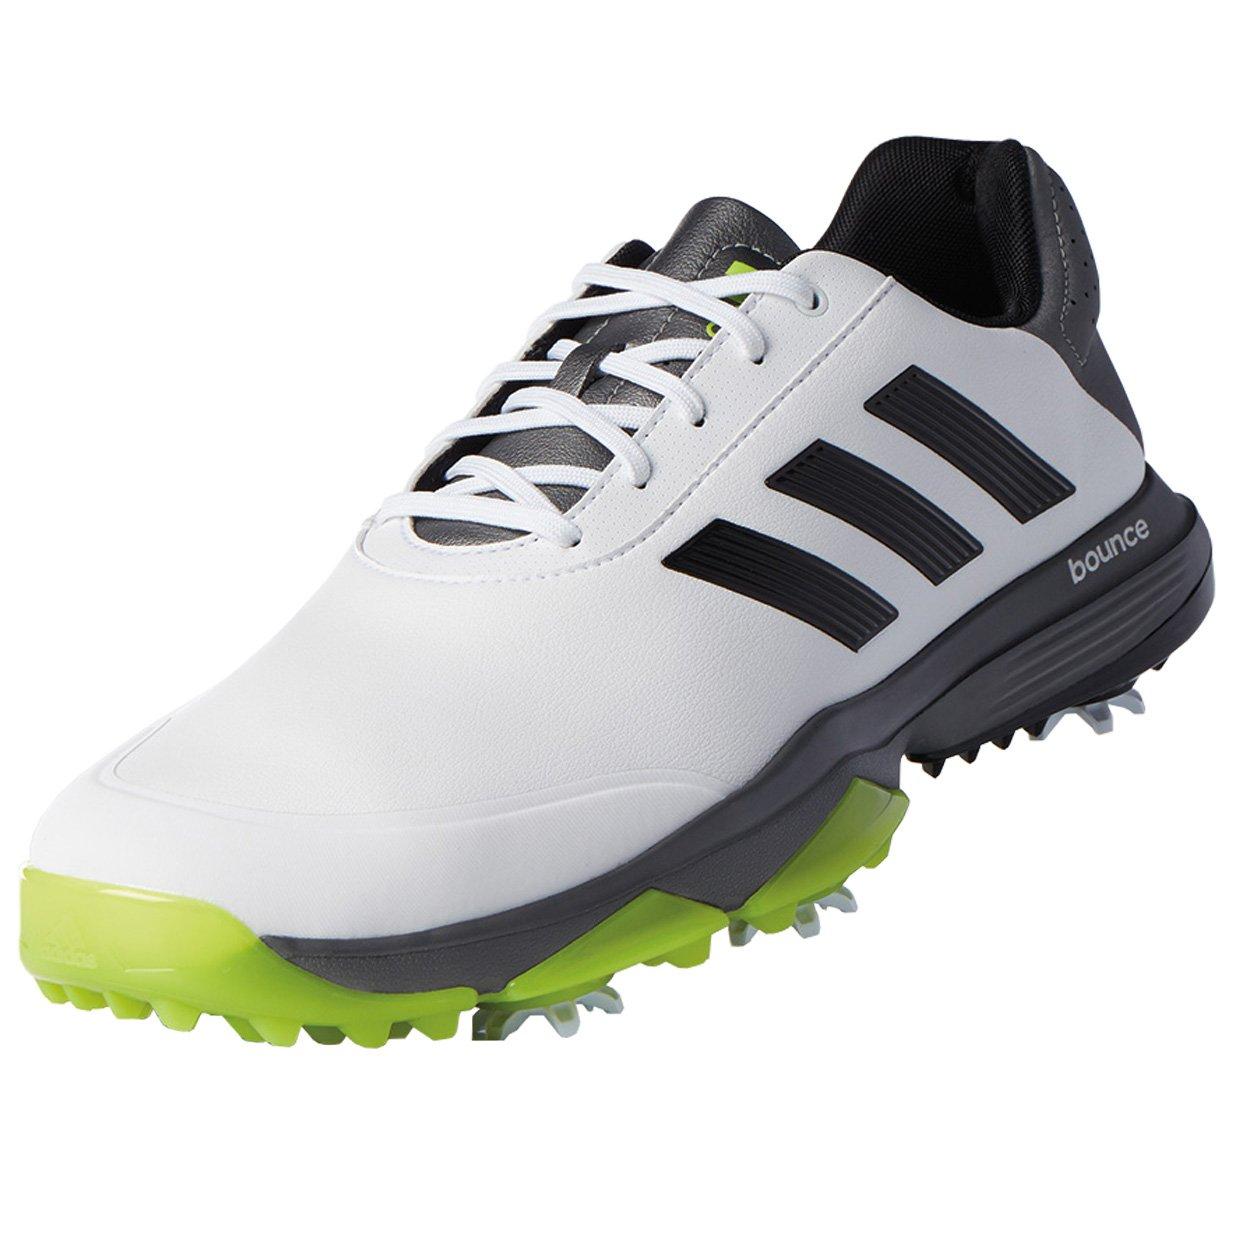 adidas Men's Adipower Bounce Golf Shoe, White/Black/Solar Slime, 13 M US